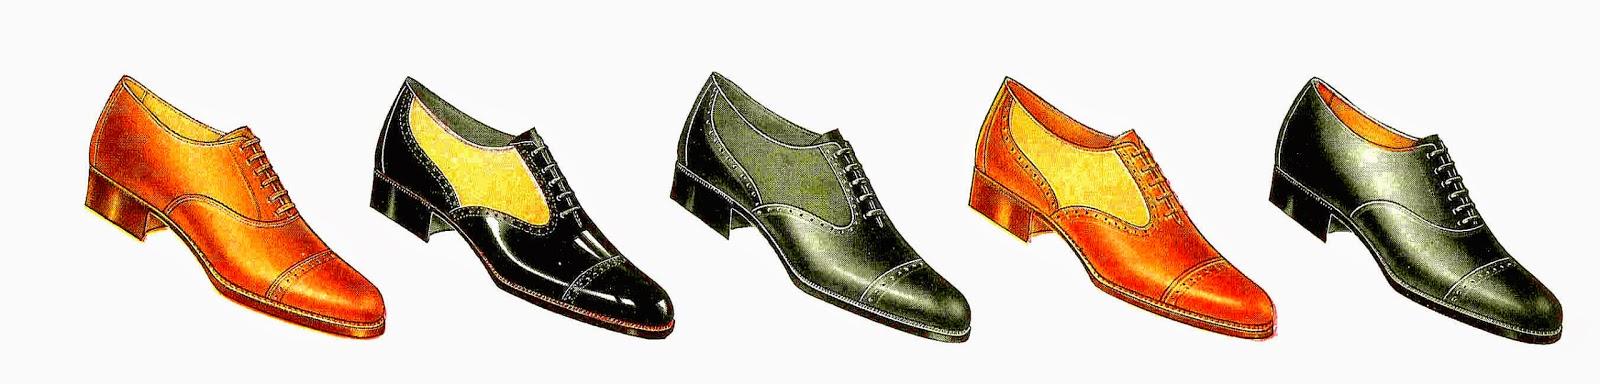 Gents Fashion Shoes